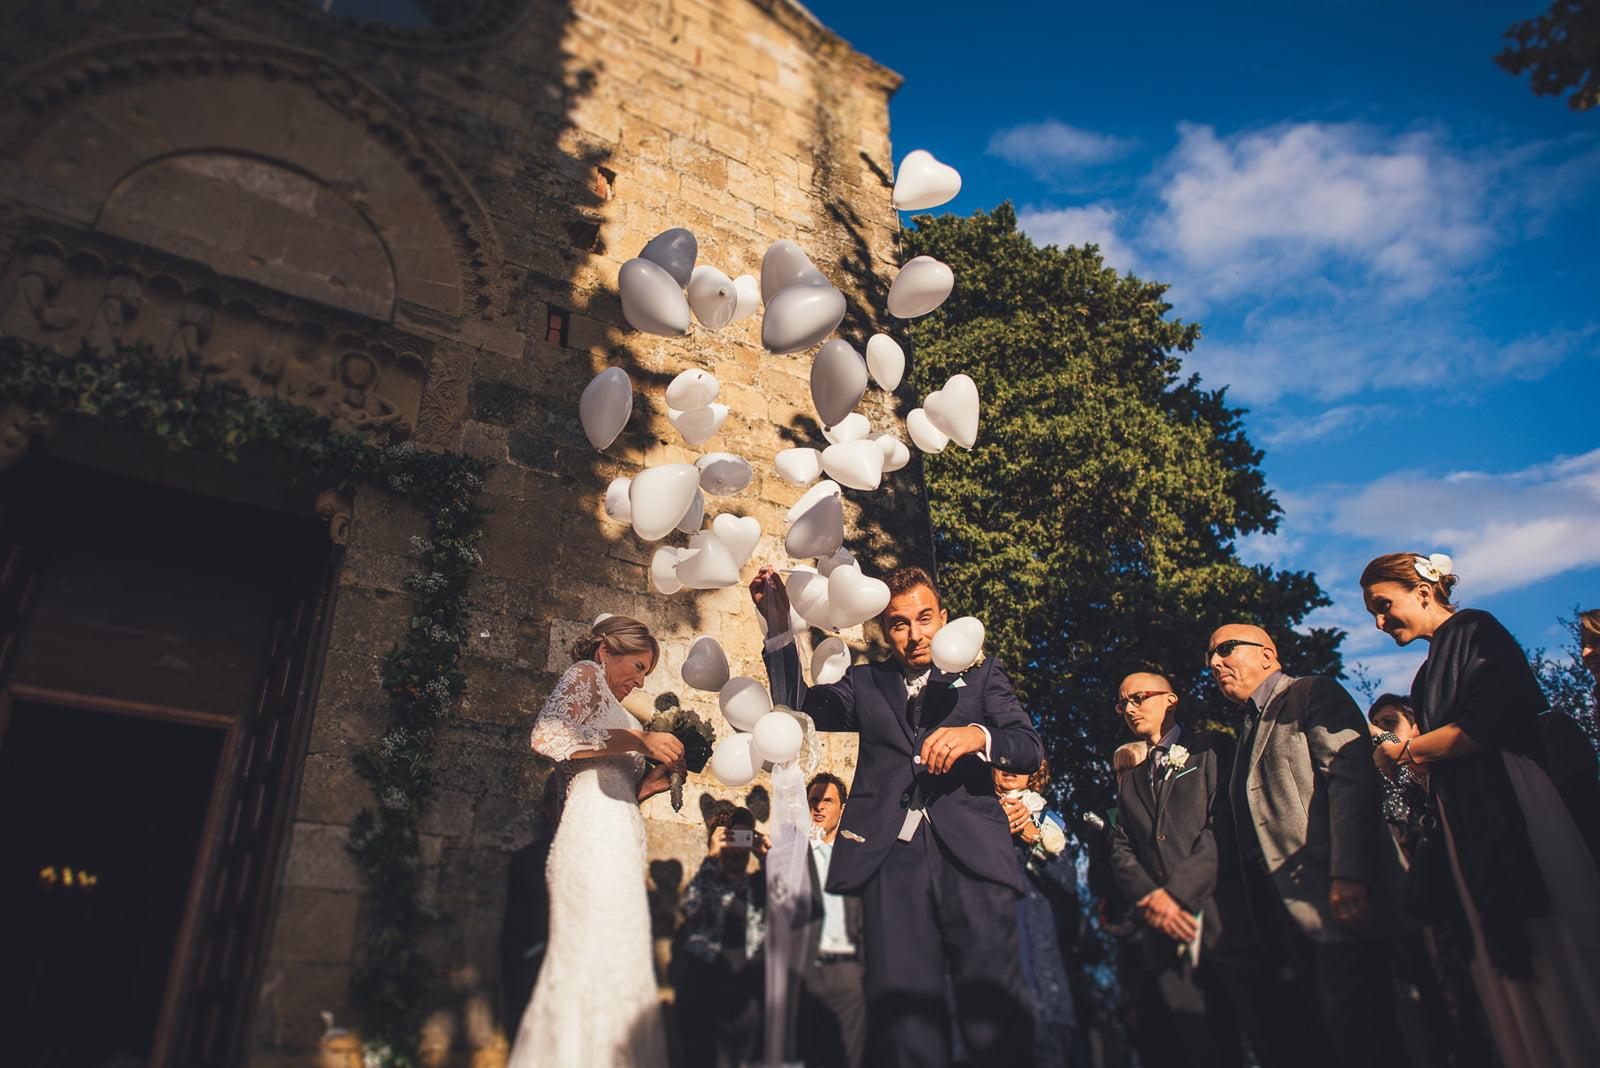 060-wedding-florence-palazzo-borghese